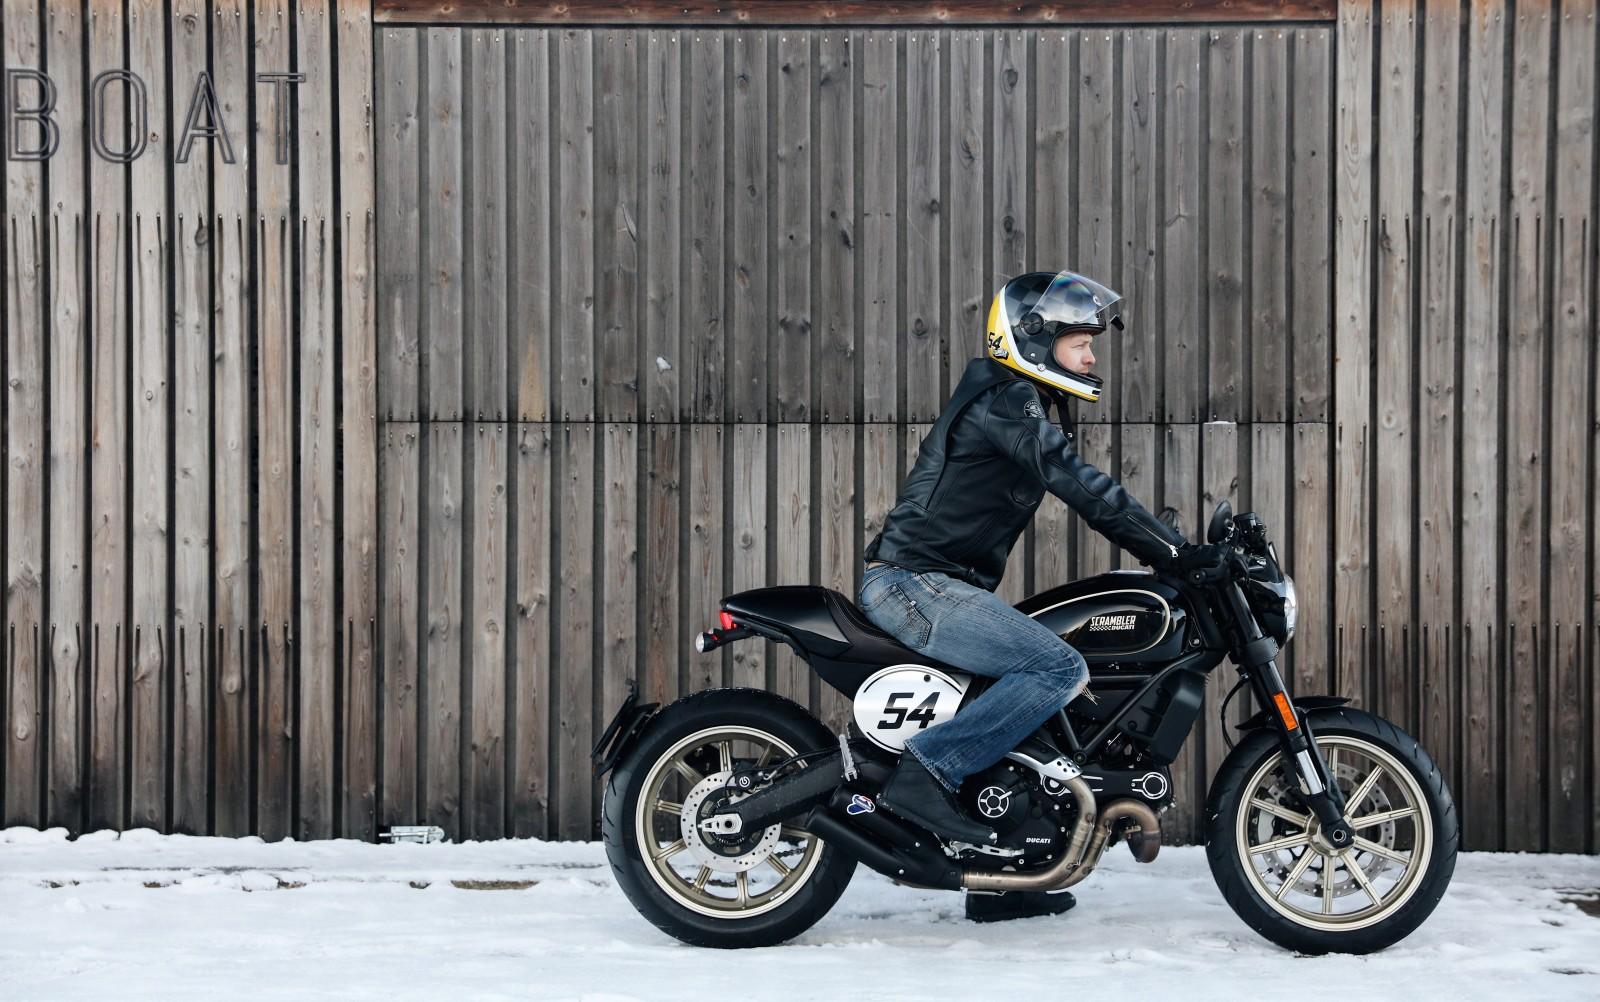 Ducati Scrambler Cafe Racer Launched In India Motoroids